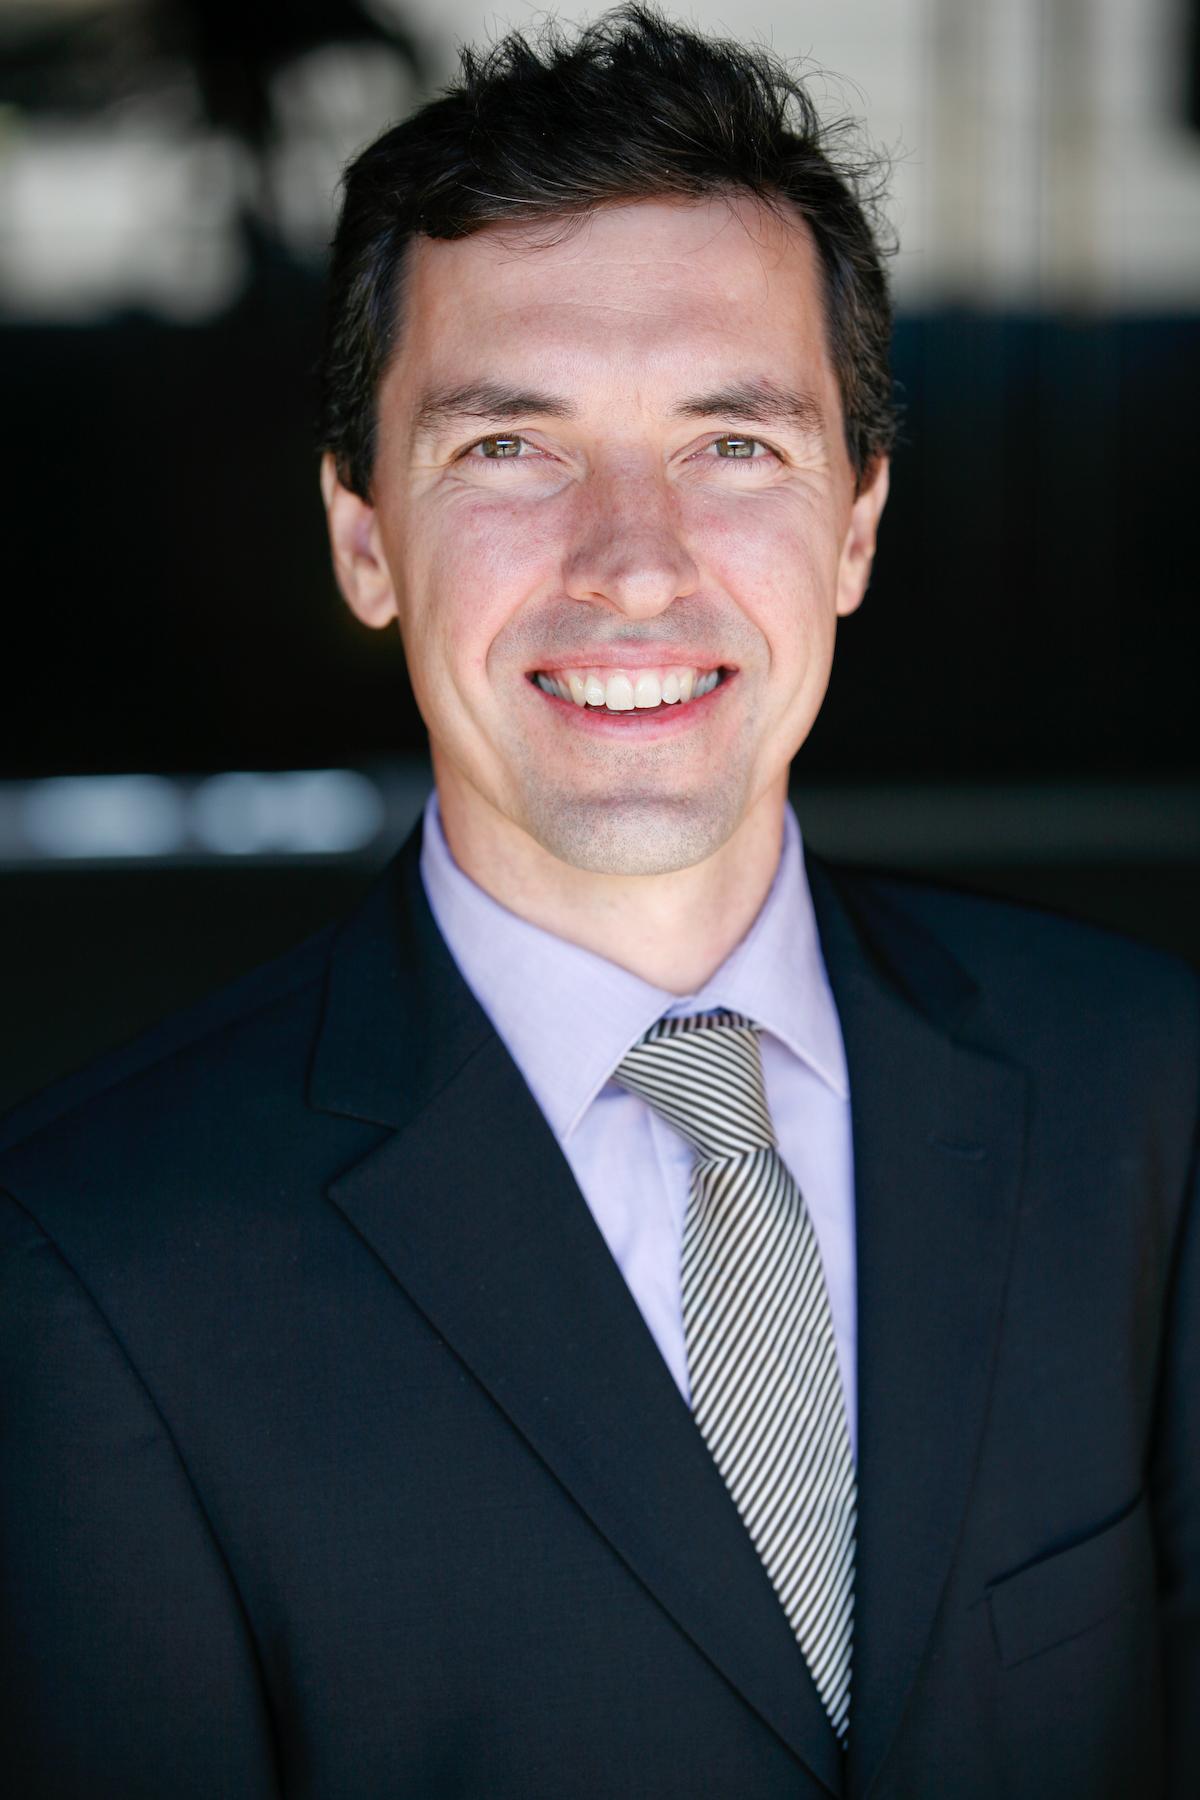 Julian Whike, Principal